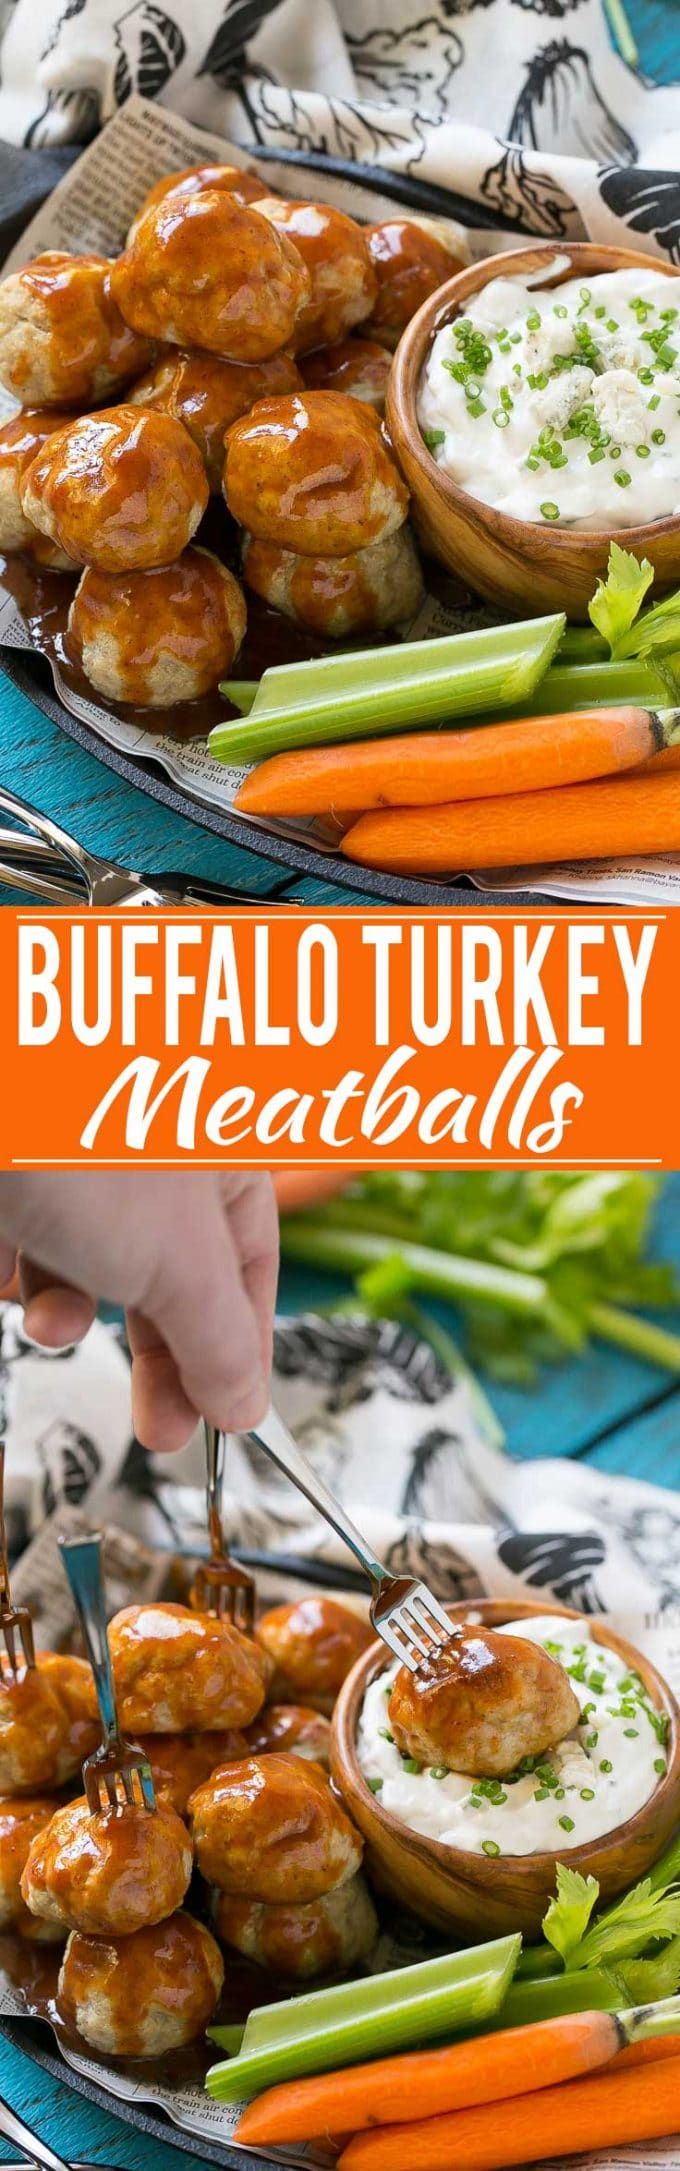 Buffalo Turkey Meatball Recipe | Buffalo Turkey Meatballs | Chipotle Sauce Meatballs | Skinny Blue Cheese Dip | Buffalo Meatballs